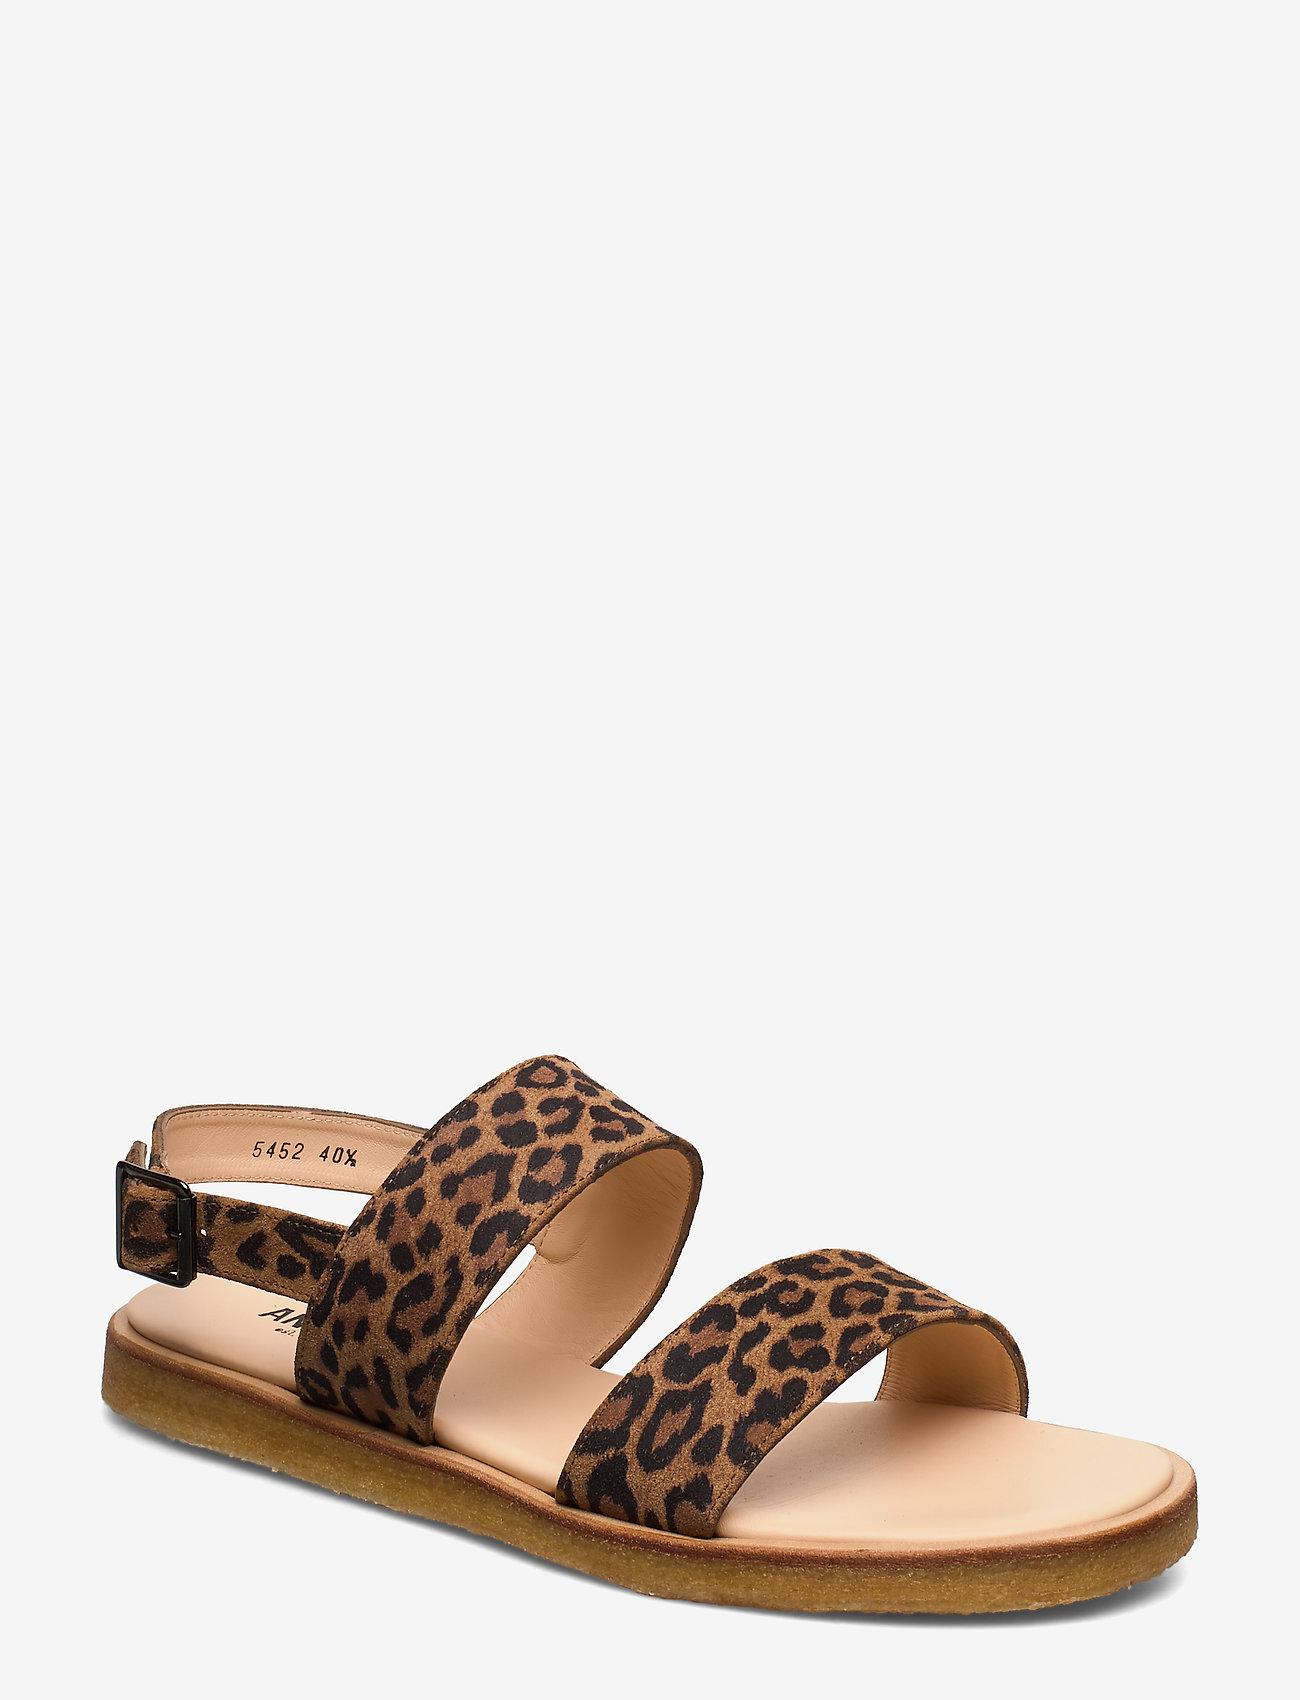 ANGULUS - 5452 - sandales - 2164 leopard